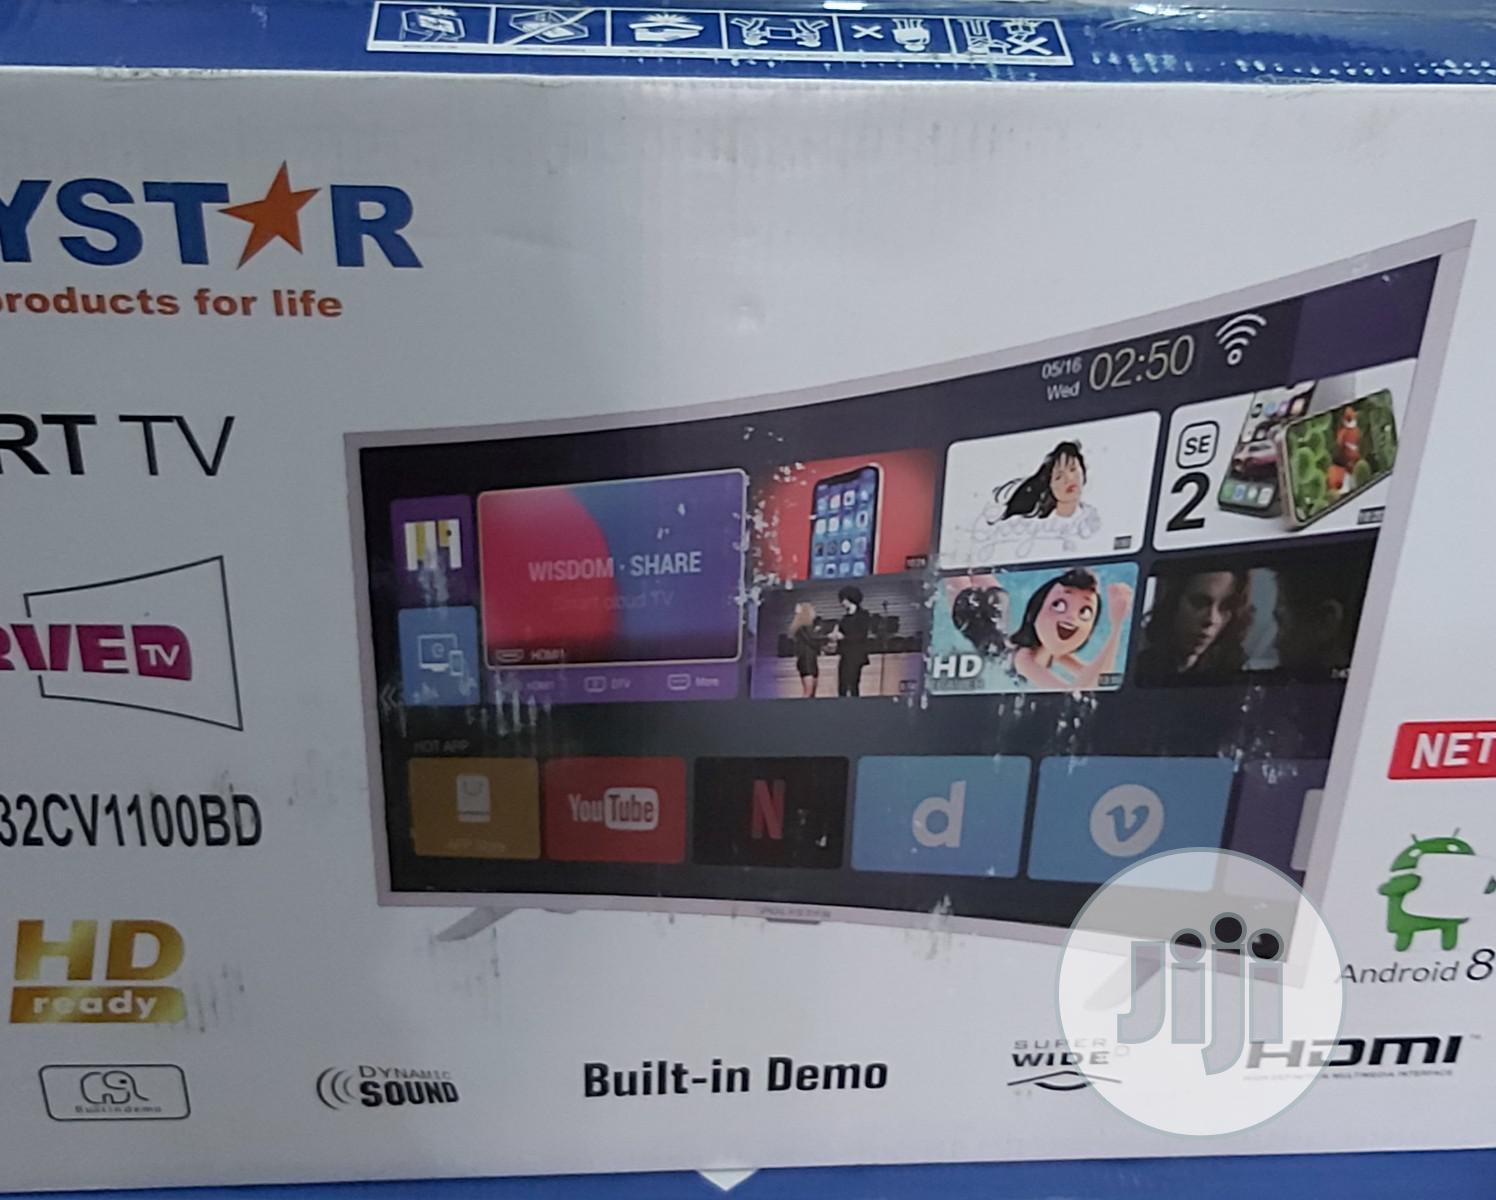 Polystar SMART Curved TV Pv-Jp32cv1100bd | TV & DVD Equipment for sale in Gwagwalada, Abuja (FCT) State, Nigeria